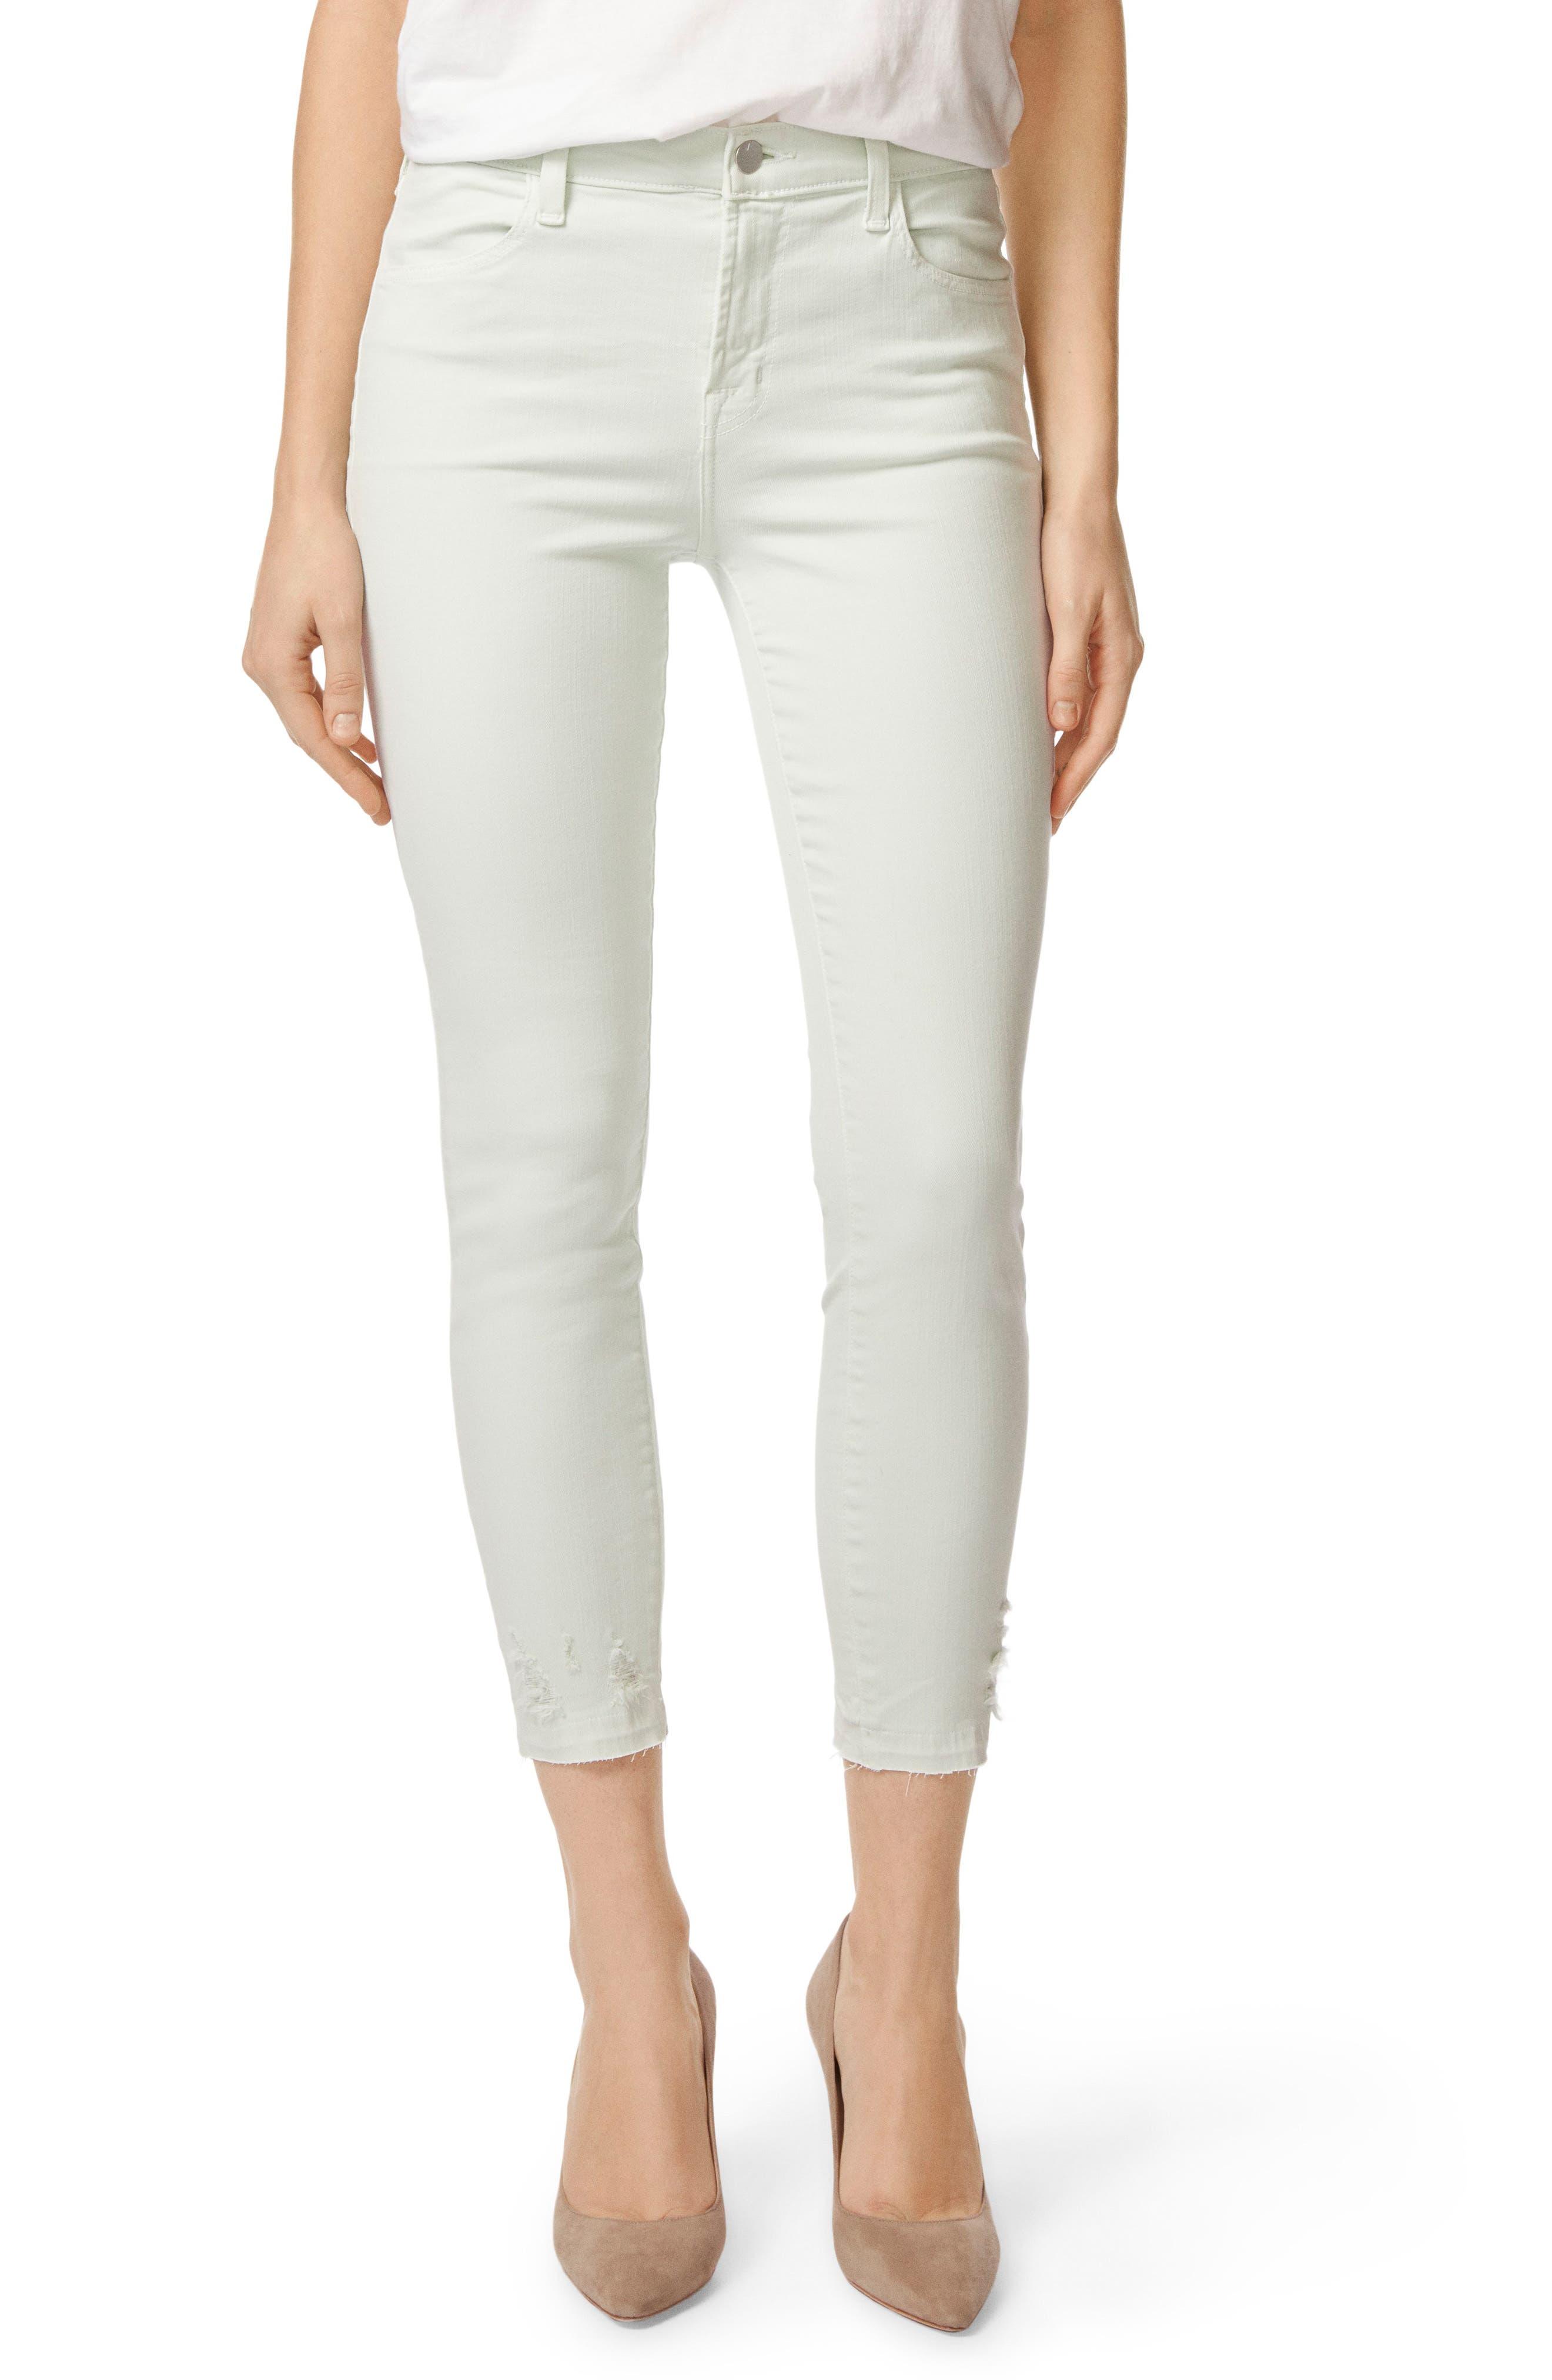 'Alana' High Rise Crop Skinny Jeans,                             Main thumbnail 1, color,                             Spearmint Destruct